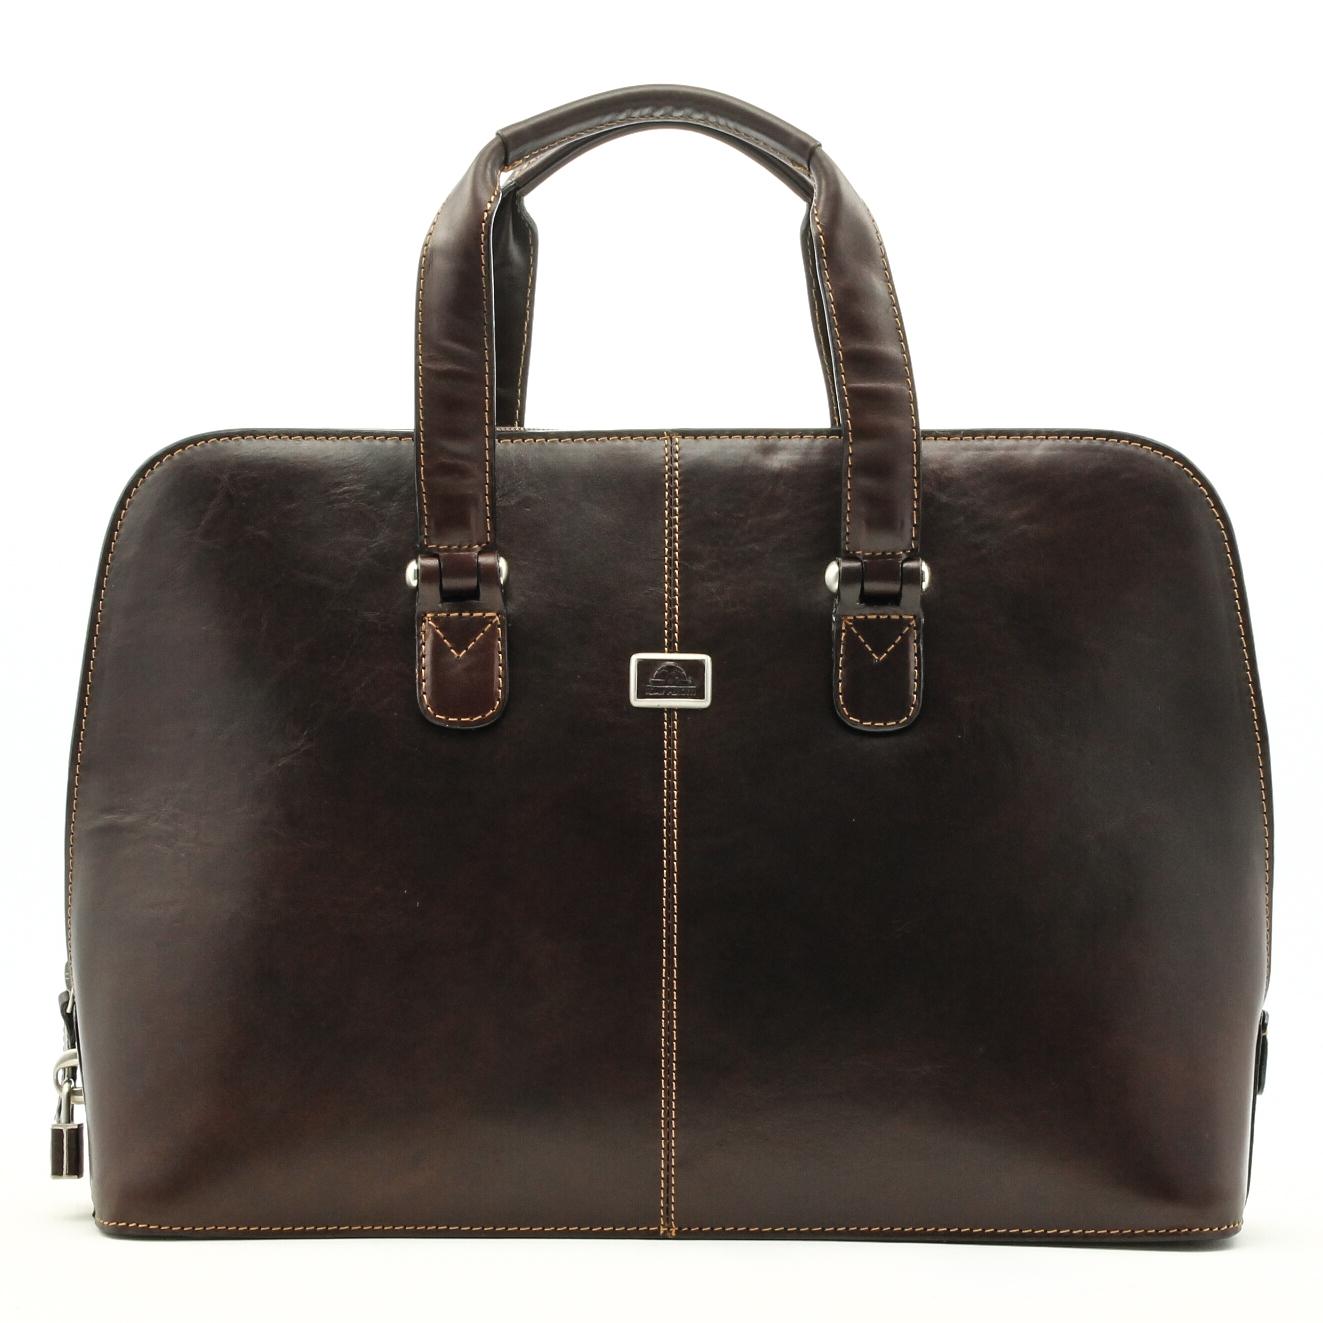 Simple Le Donne Leather Womenu0026#39;s Laptop Tote 3 Colors Womenu0026#39;s Business Bag NEW | EBay